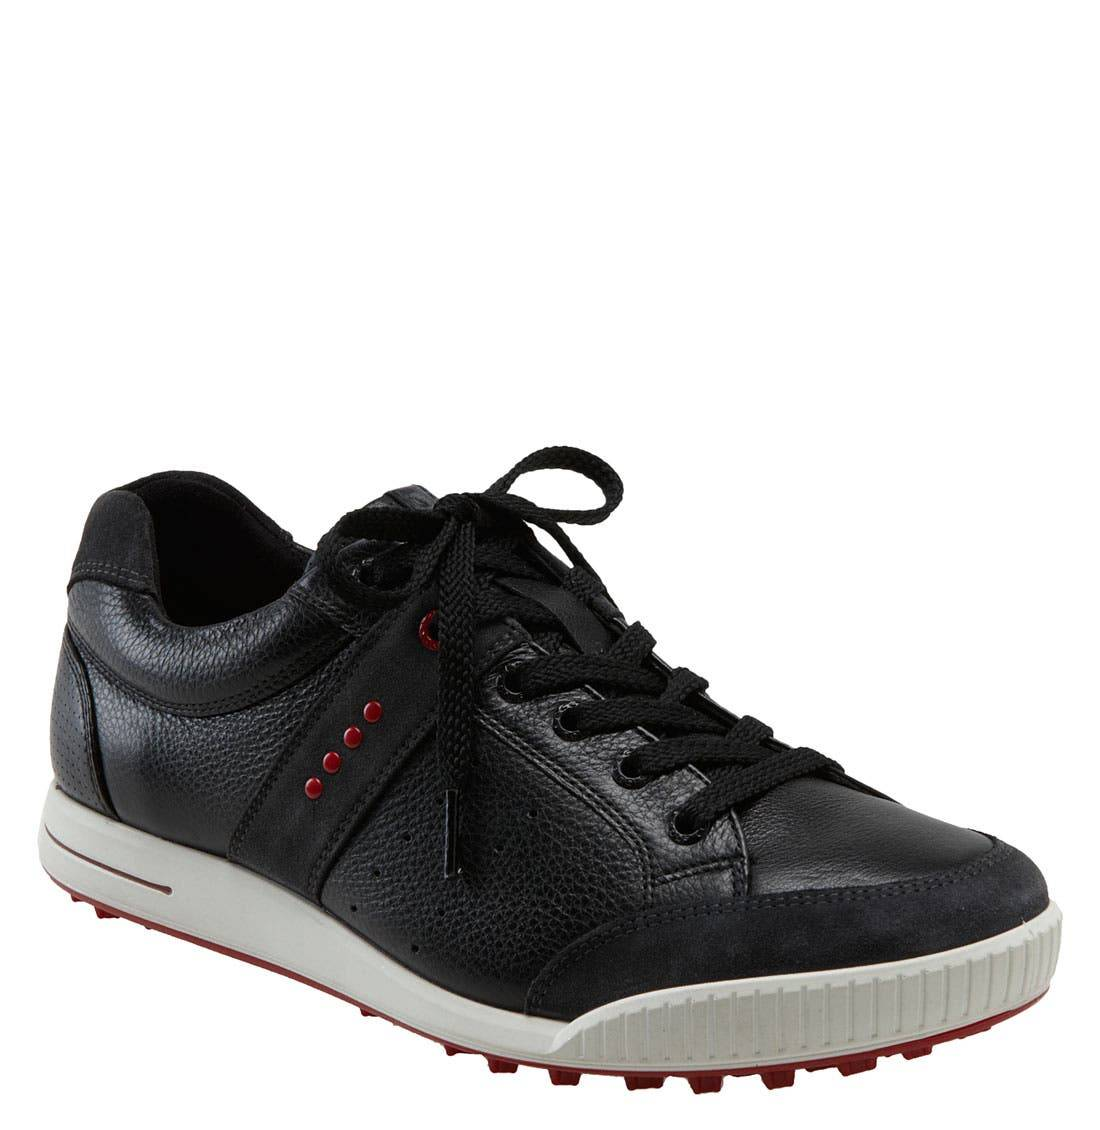 ECCO Men's Ecco 'Street Premiere' Golf Shoe, Size 11-11.5US - Black